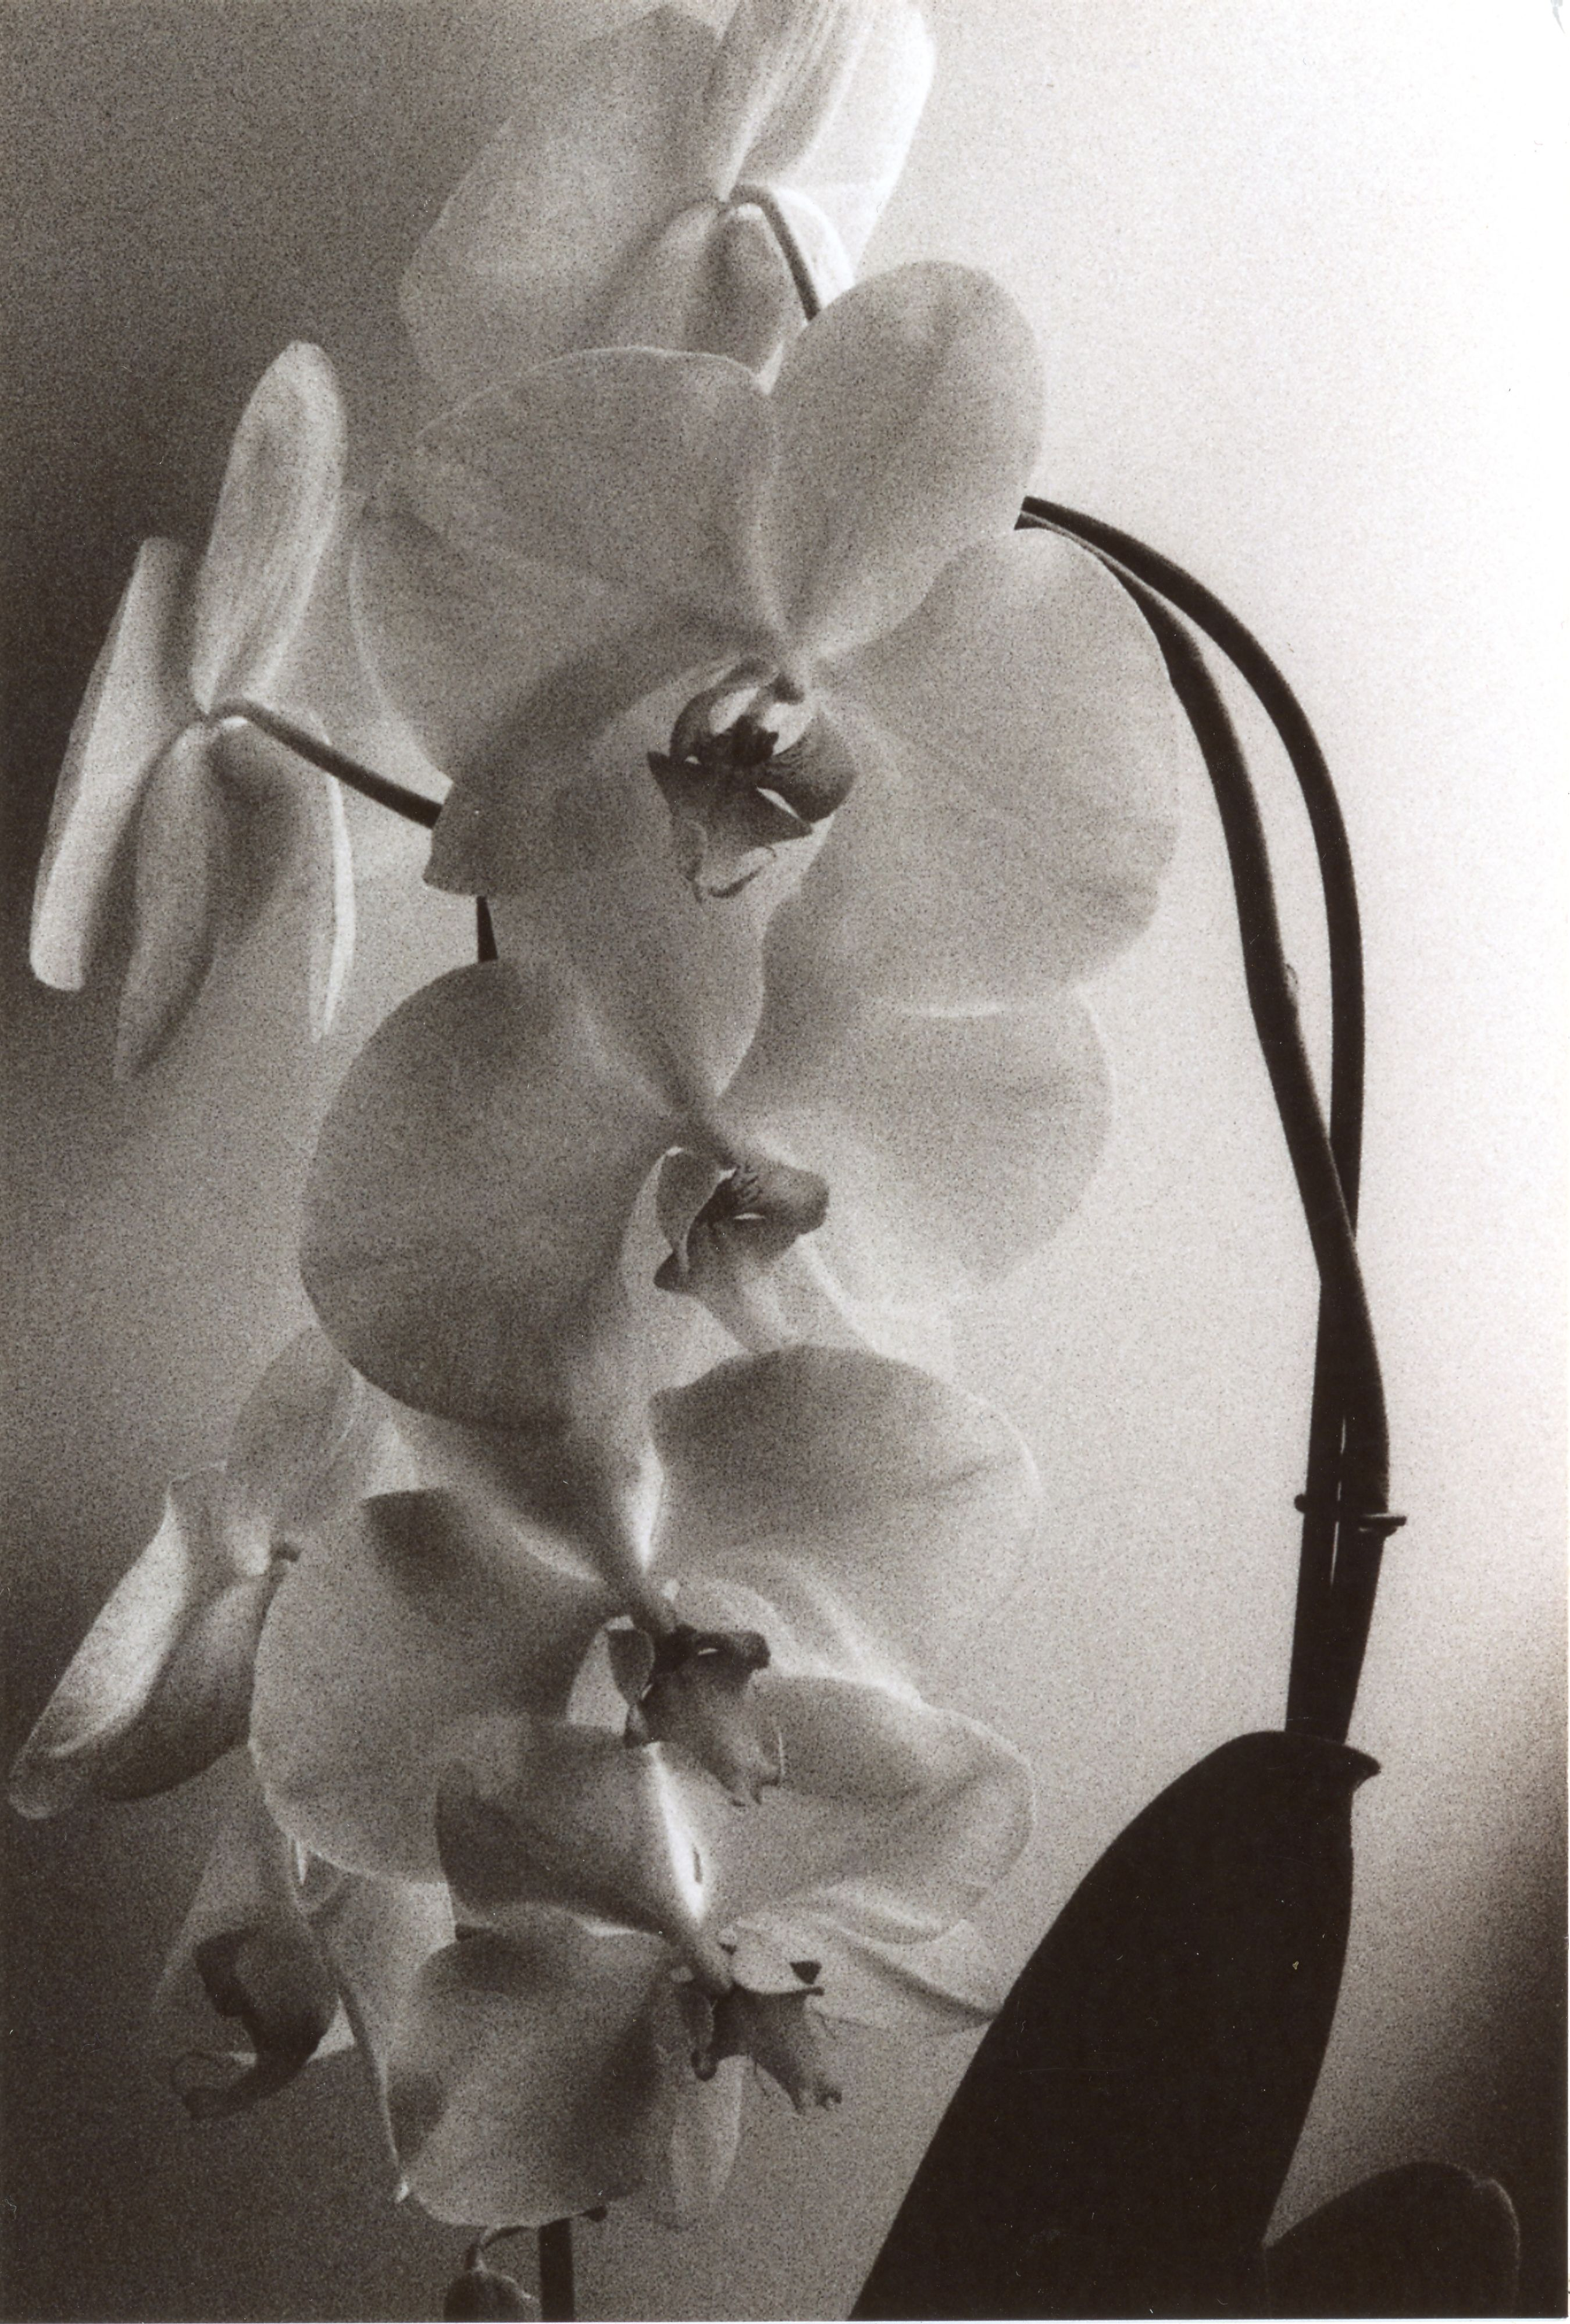 Orchidee, 2018